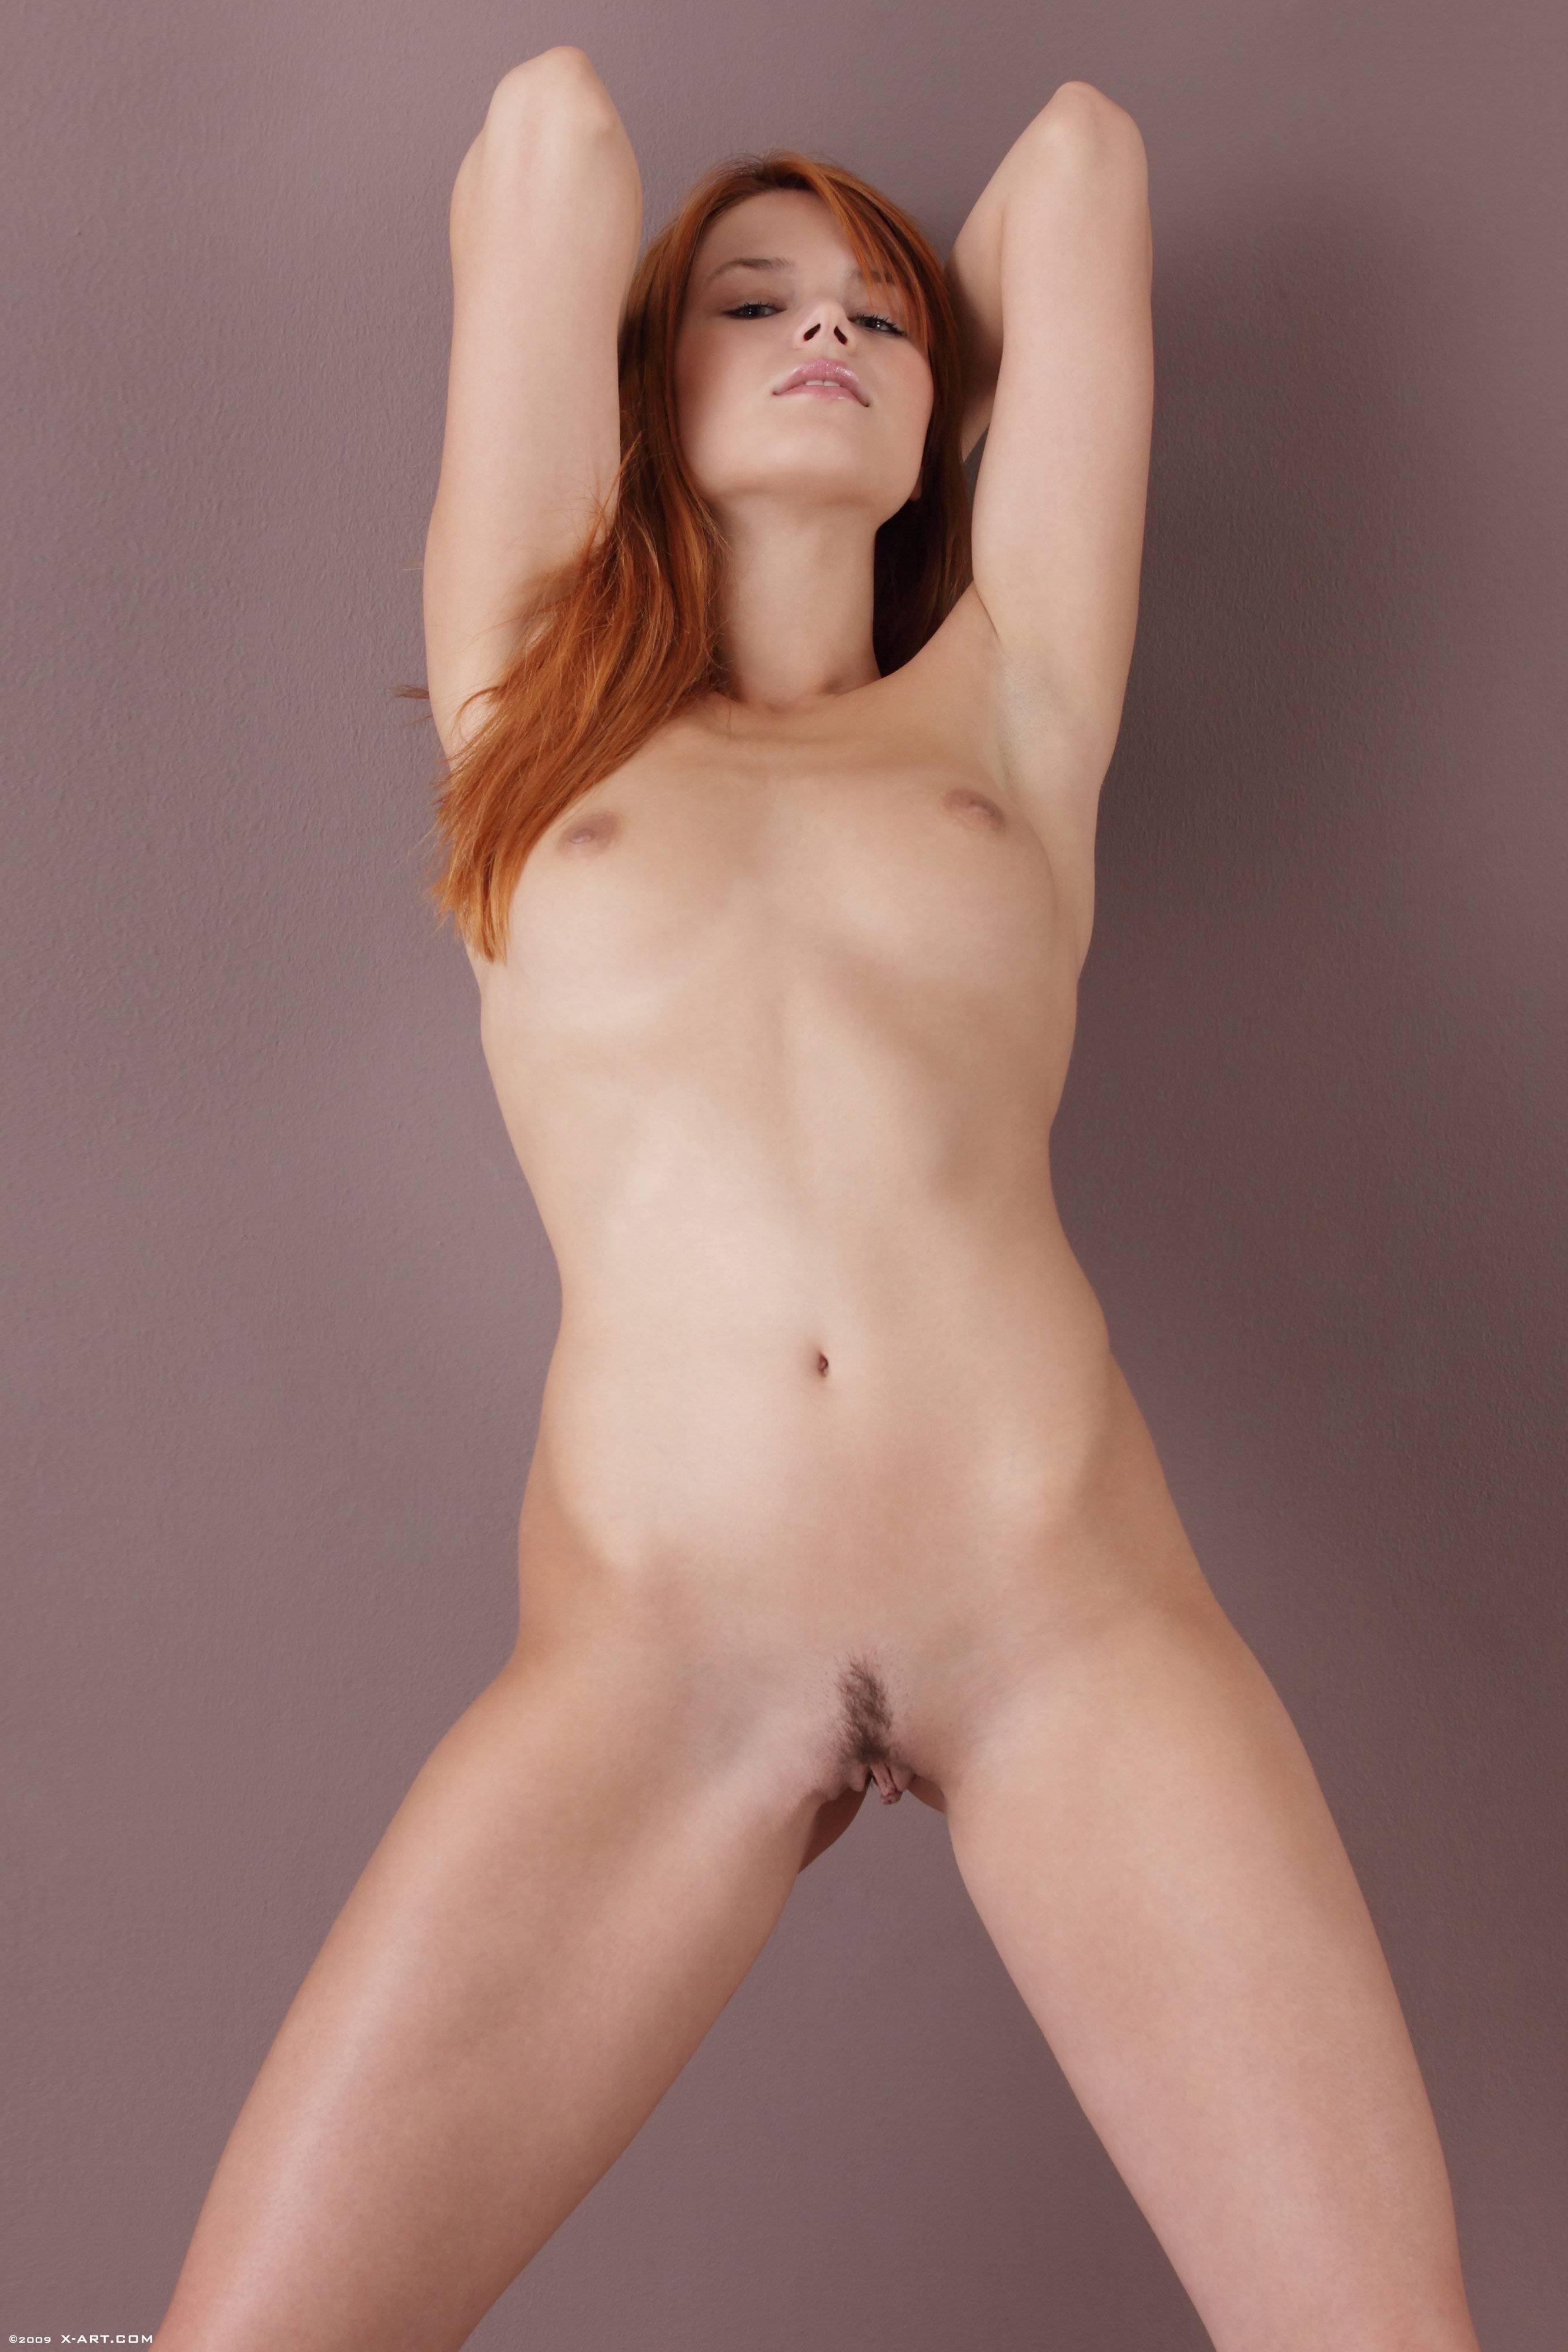 Redhead shemale tumblr